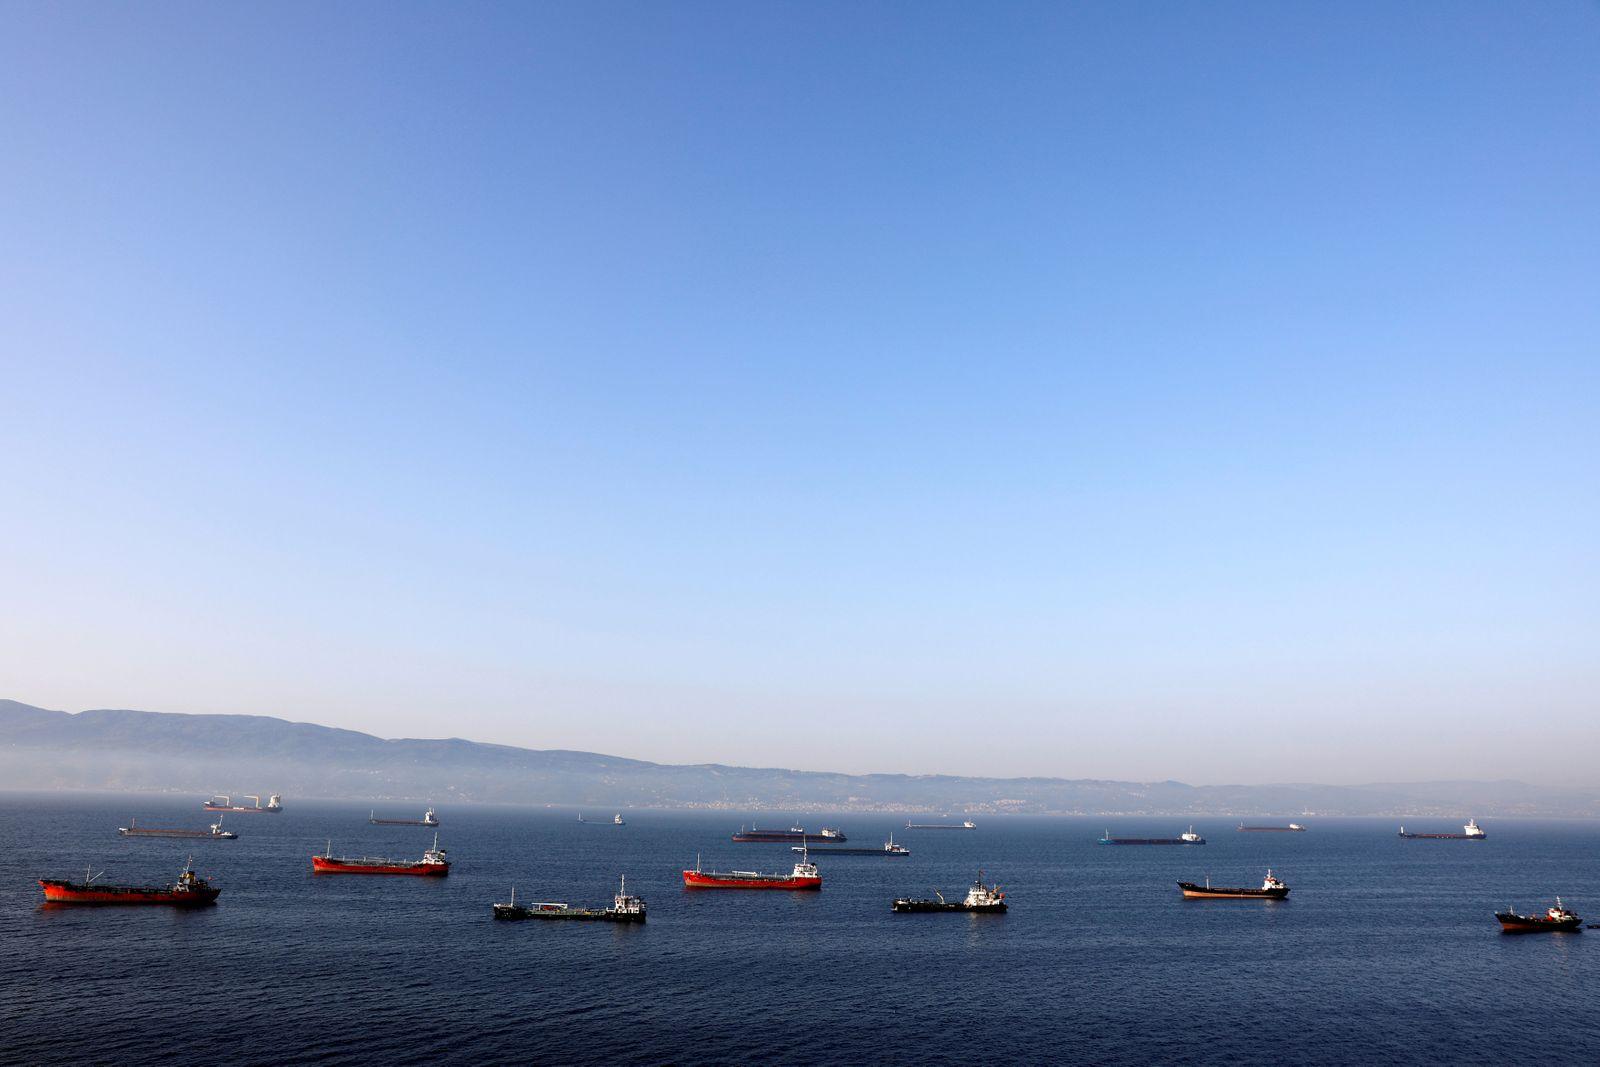 FILE PHOTO: FILE PHOTO: Oil tankers wait to dock at Tupras refinery near the northwestern Turkish city of Izmit